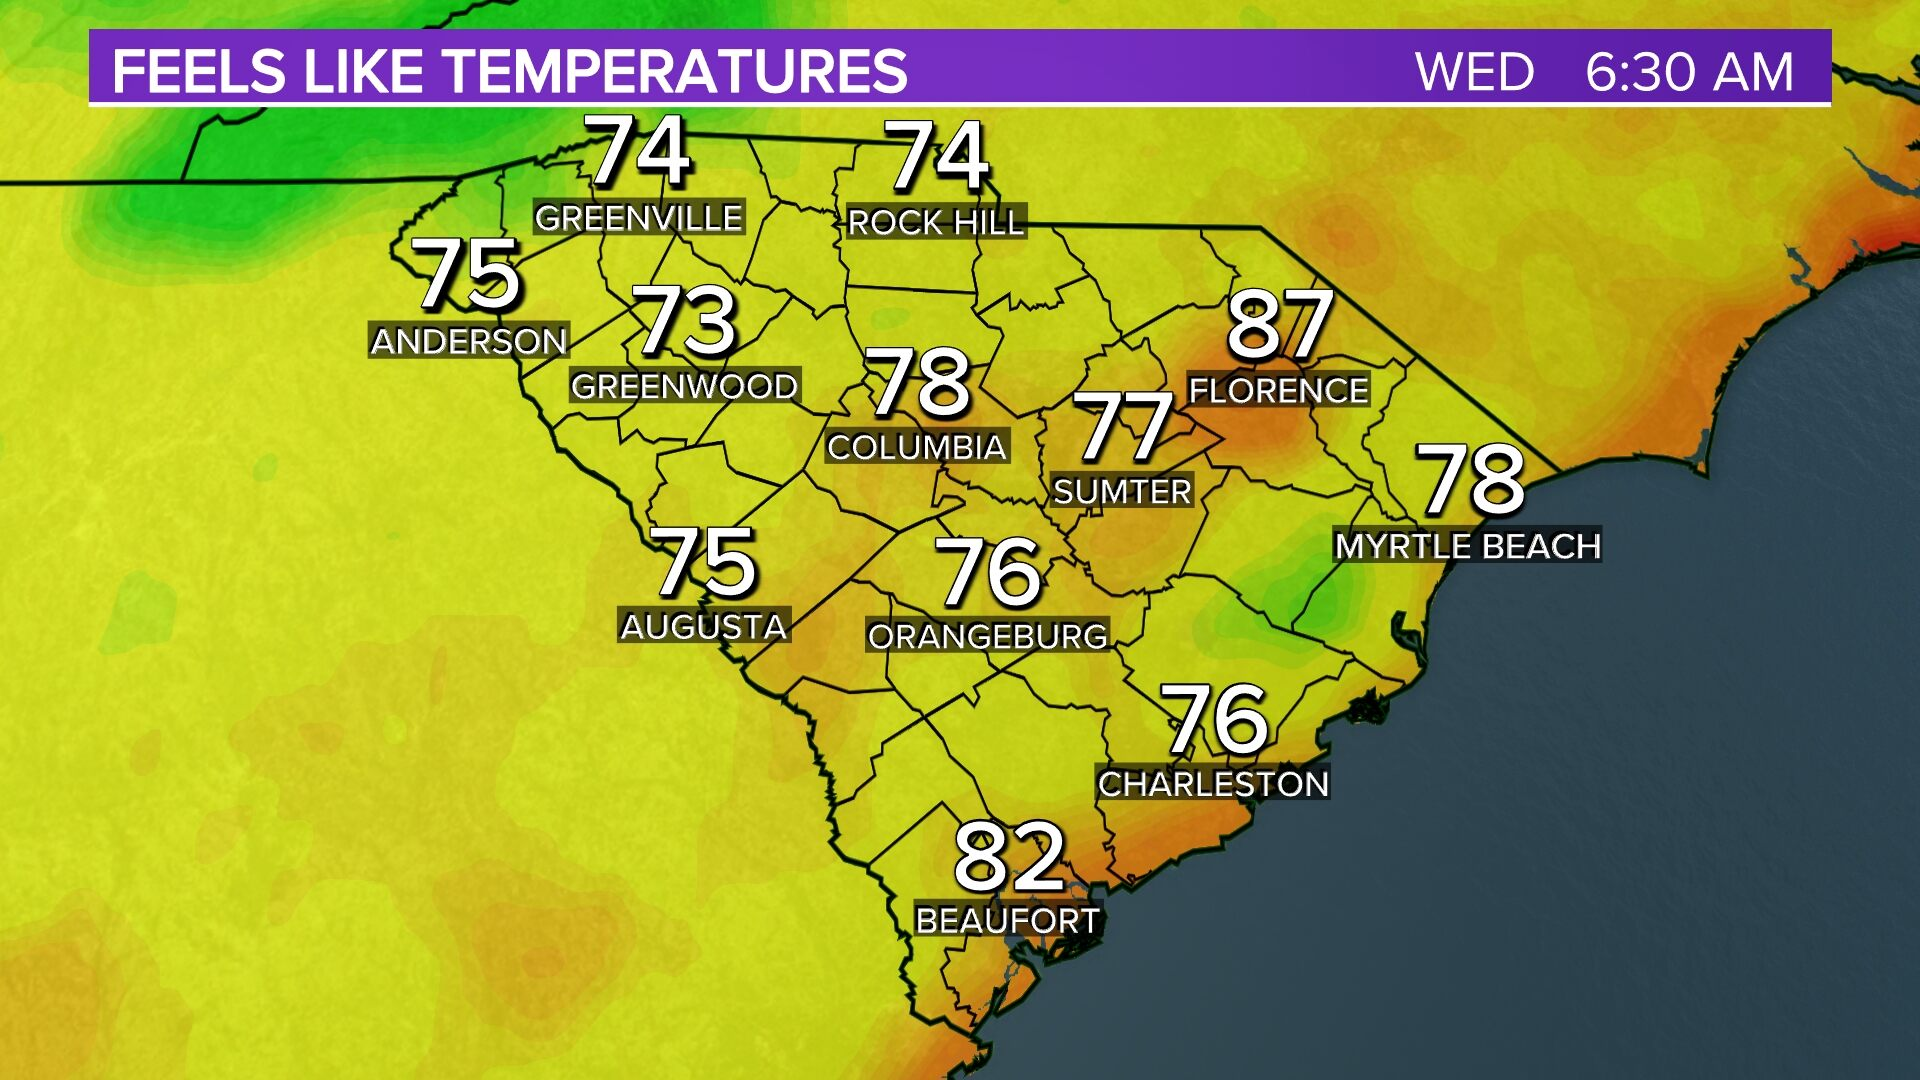 Columbia Weather Forecast And Radars Columbia South Carolina - Doppler radar columbia sc